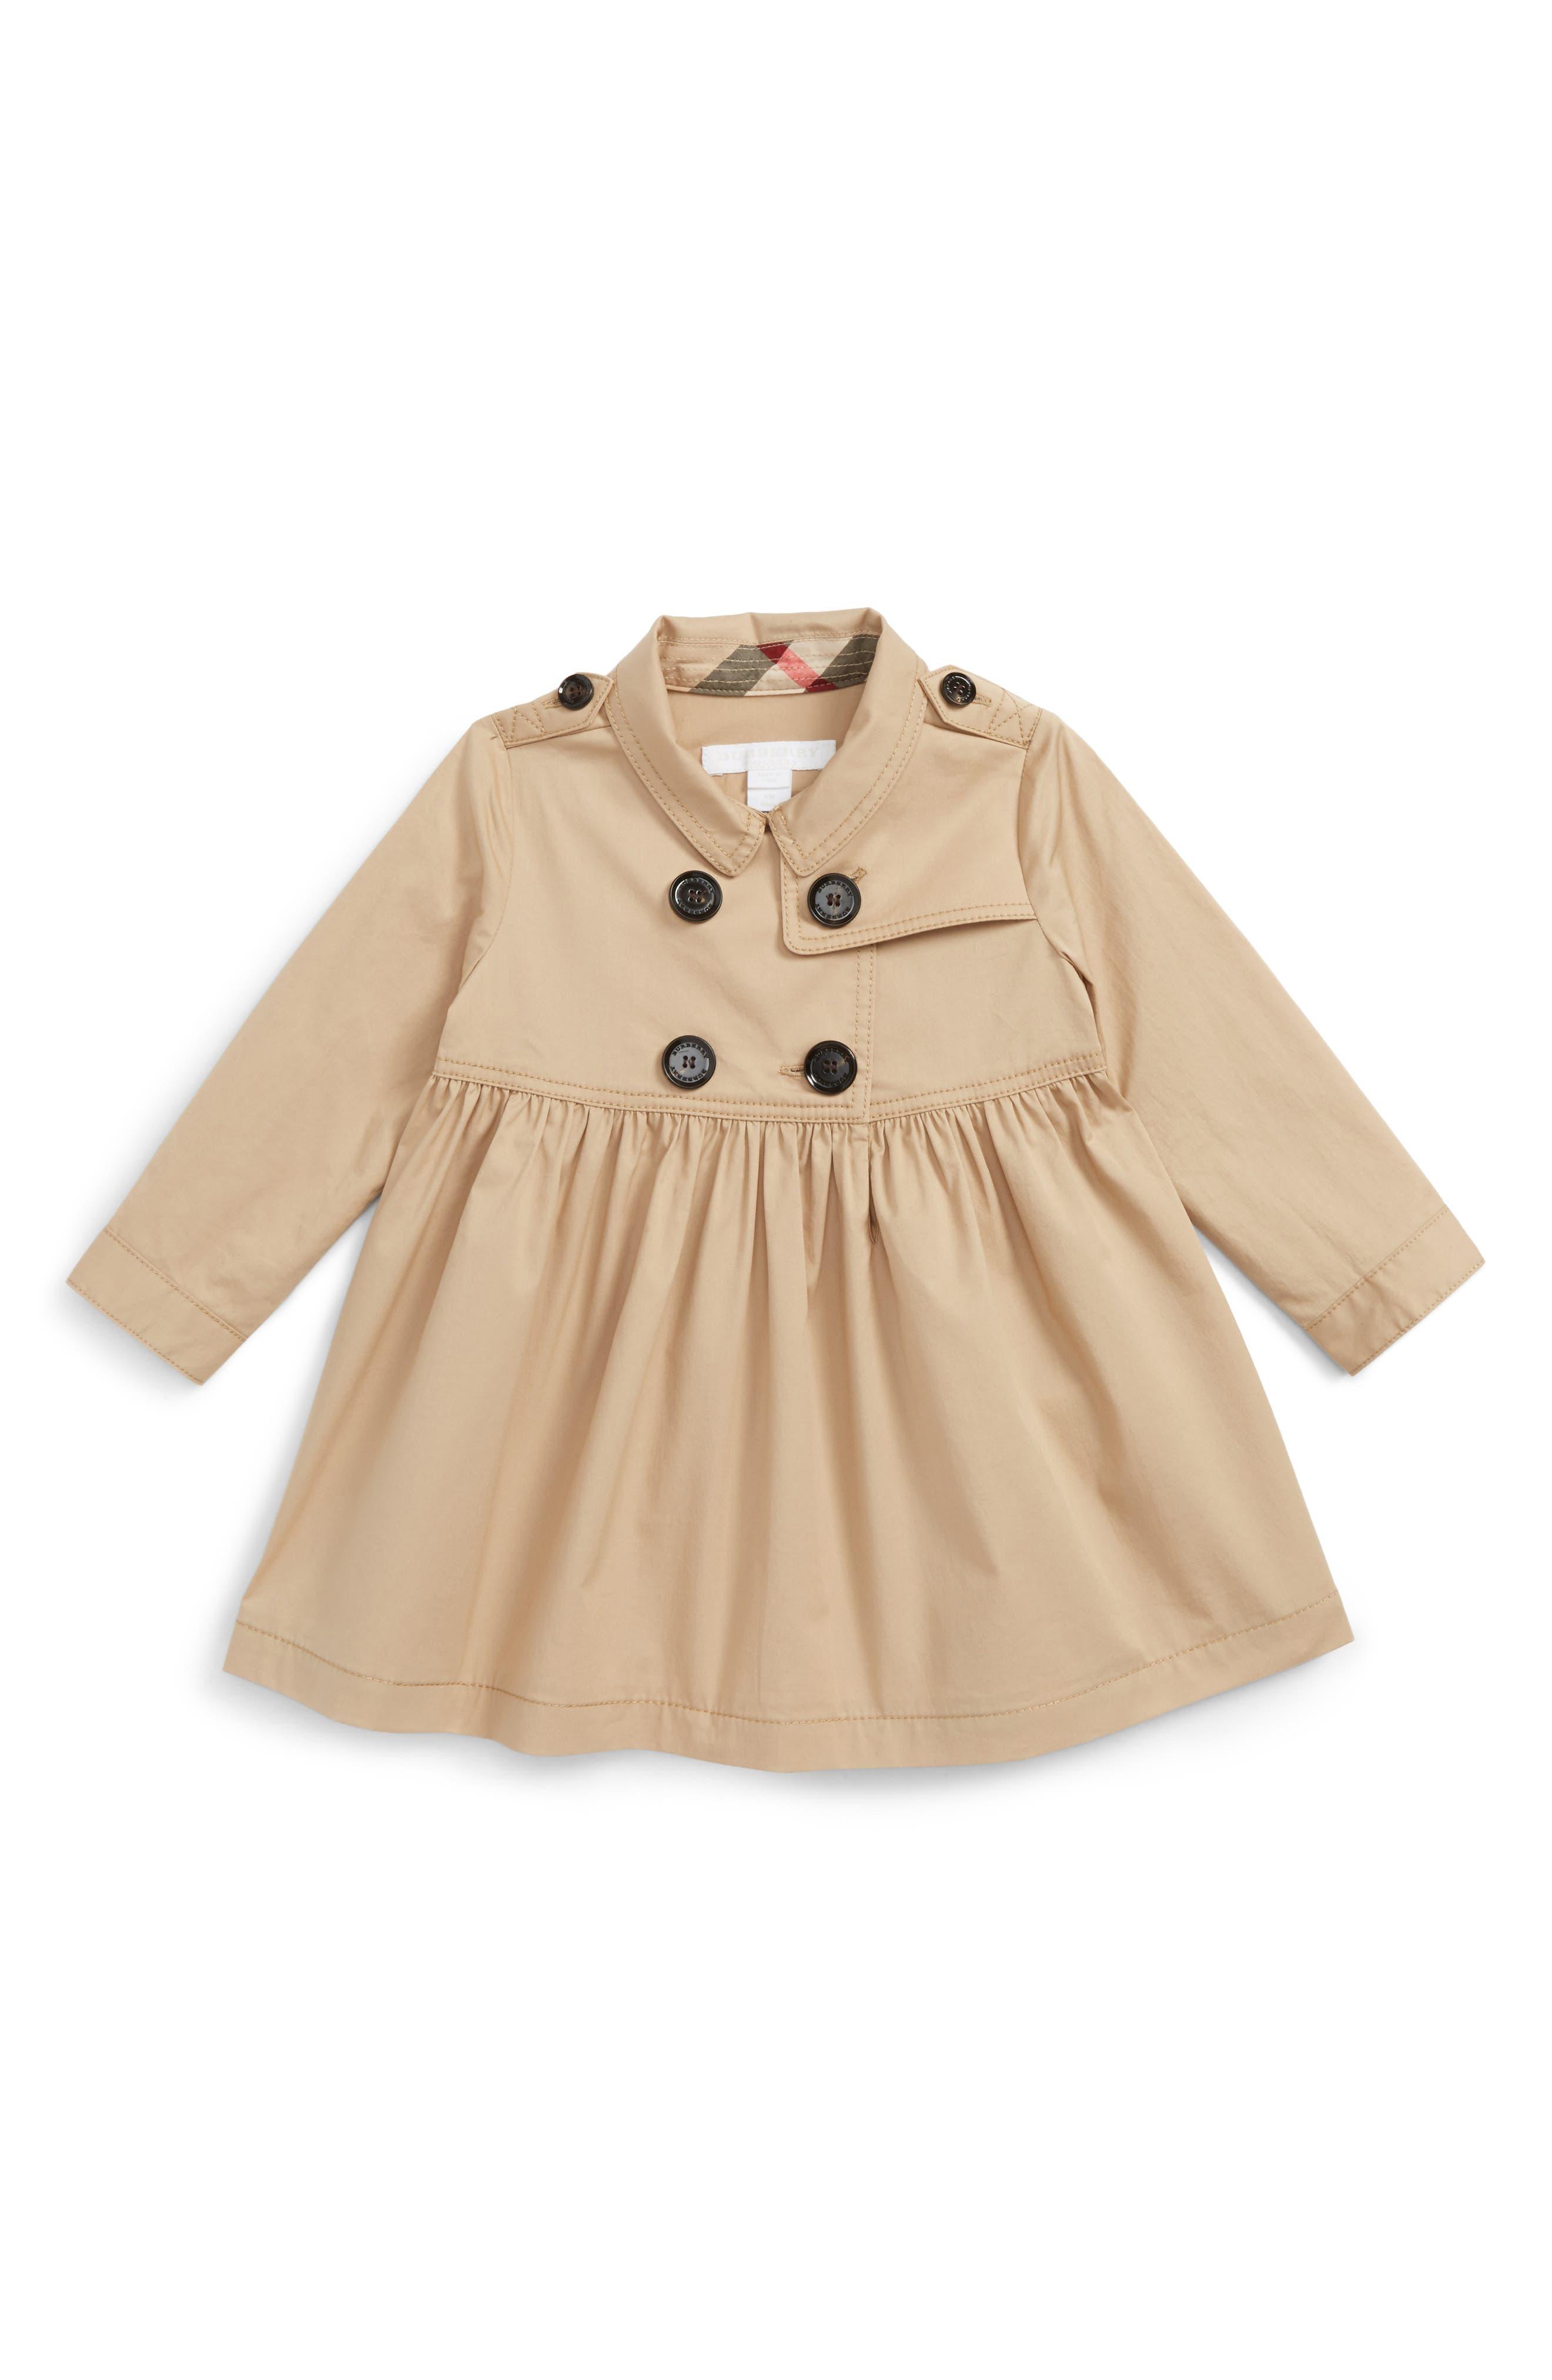 Lillybeth Dress,                             Main thumbnail 1, color,                             255